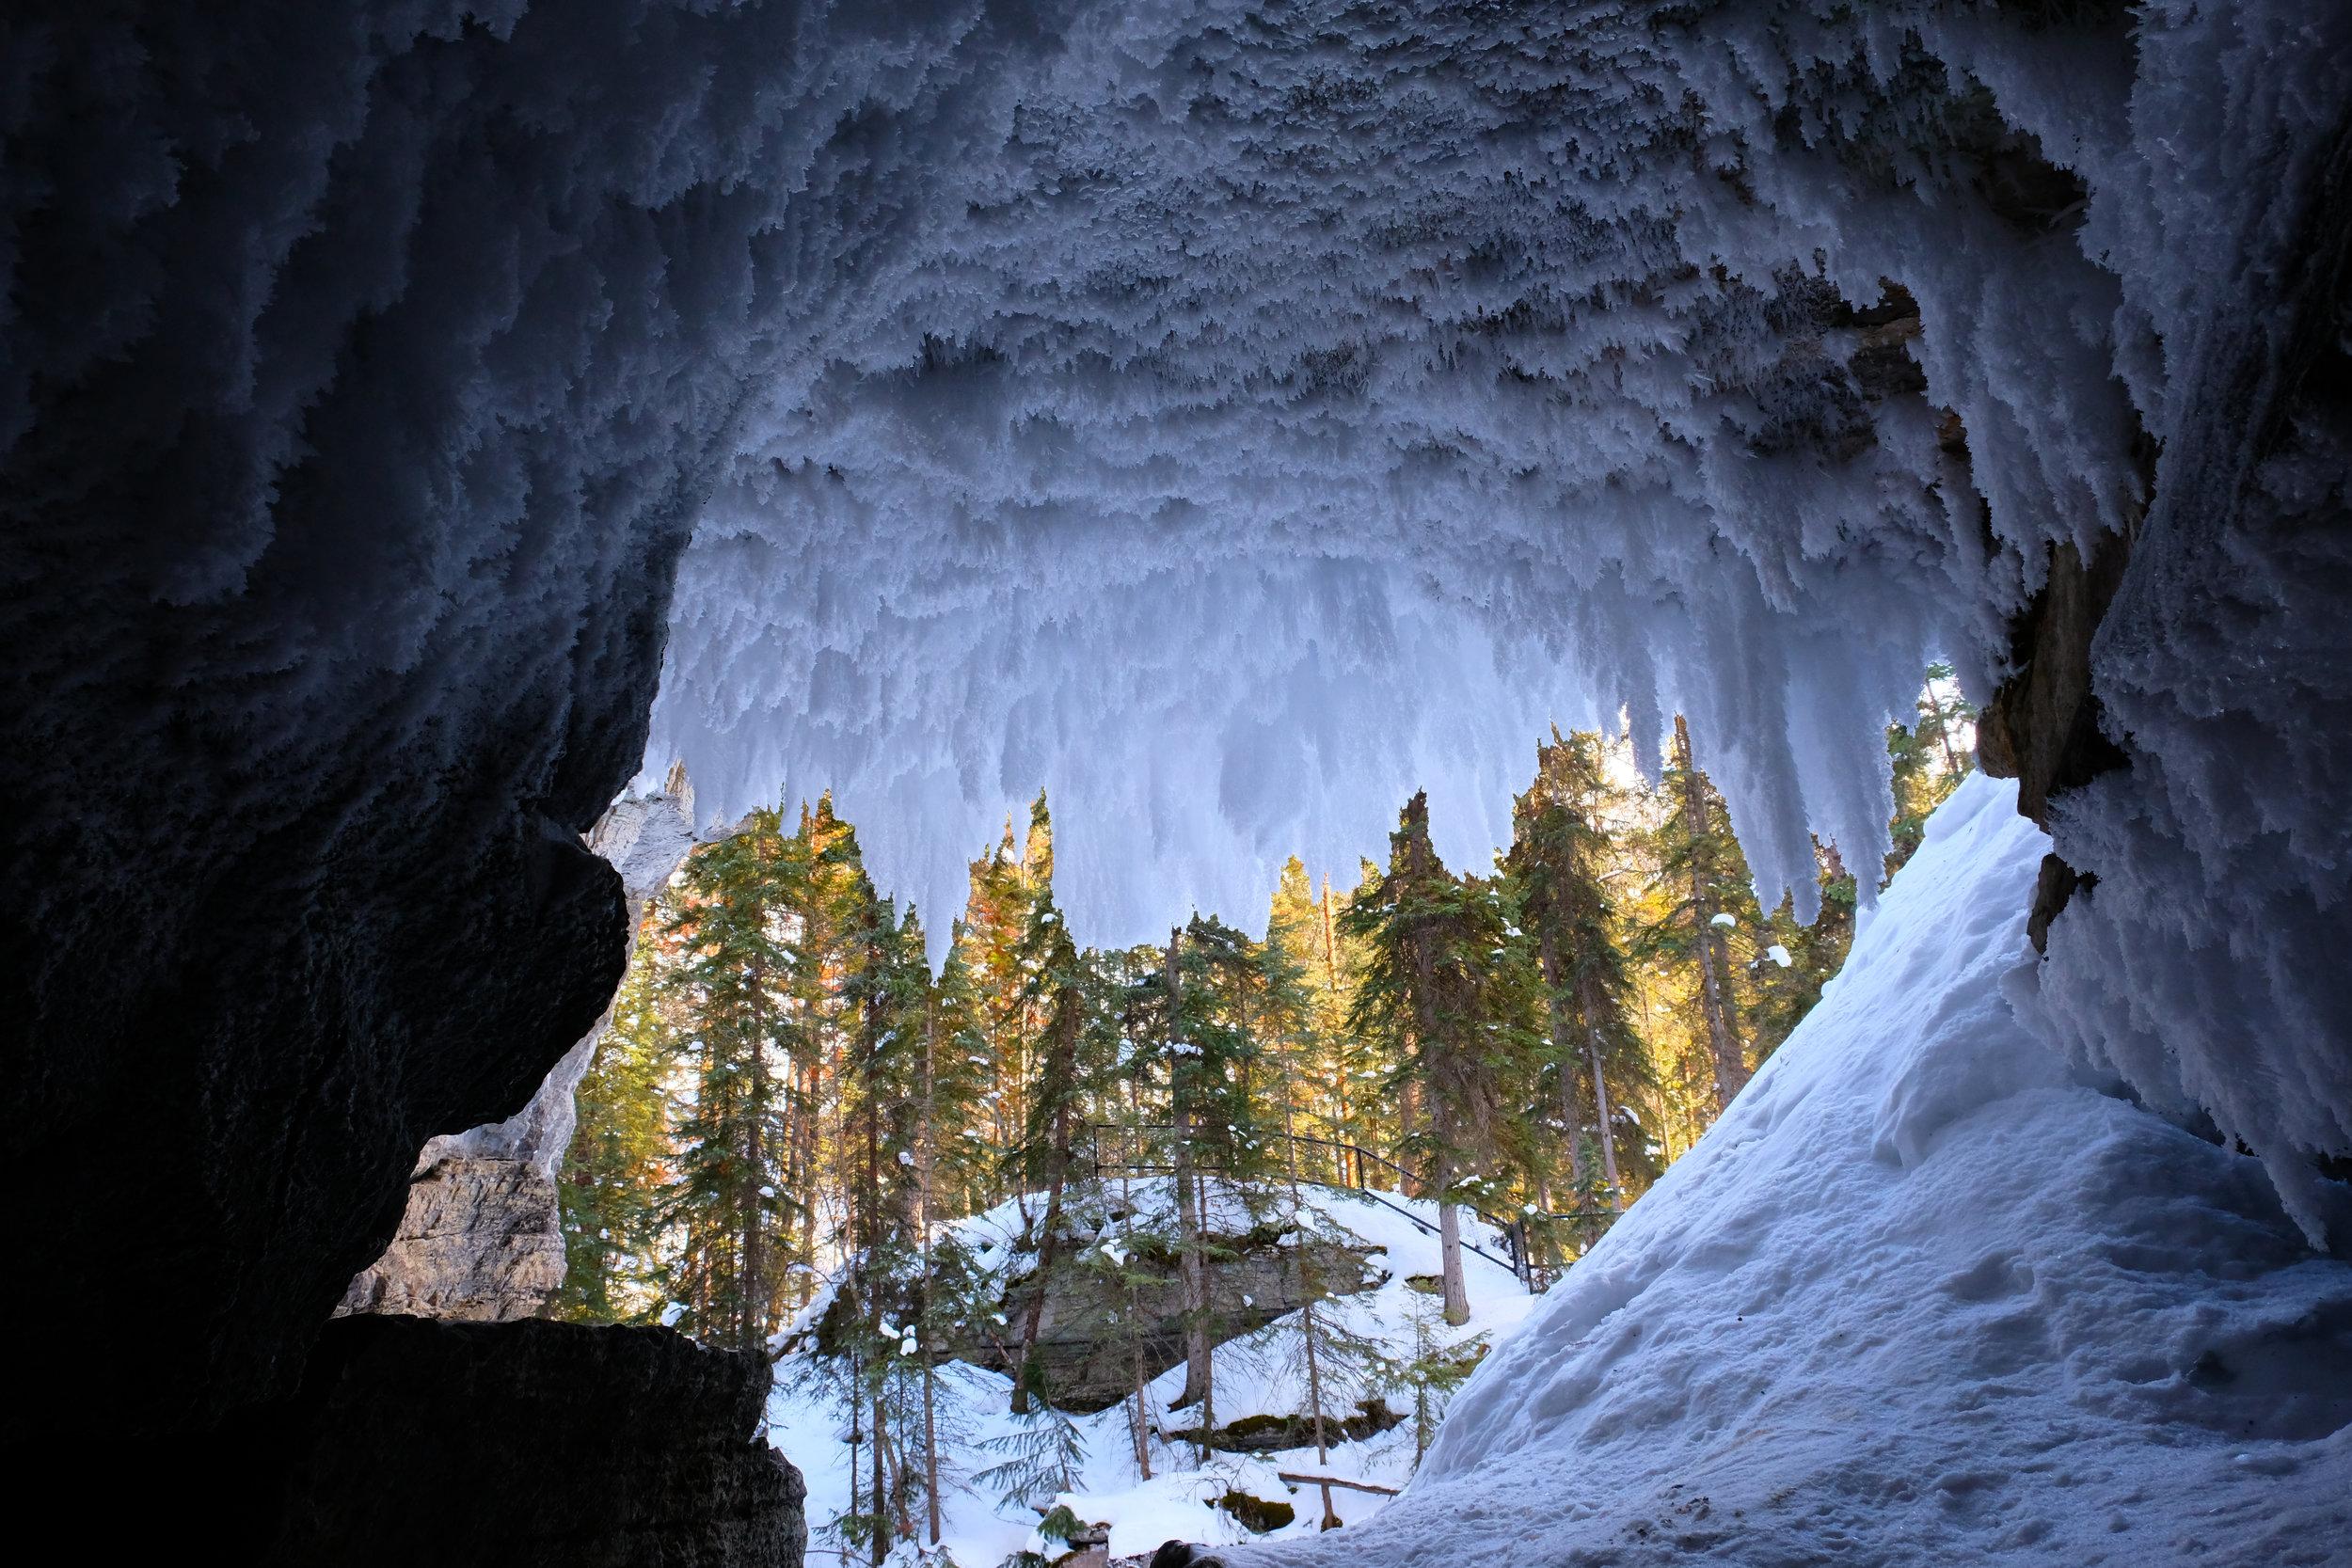 Mouse Hole Cave